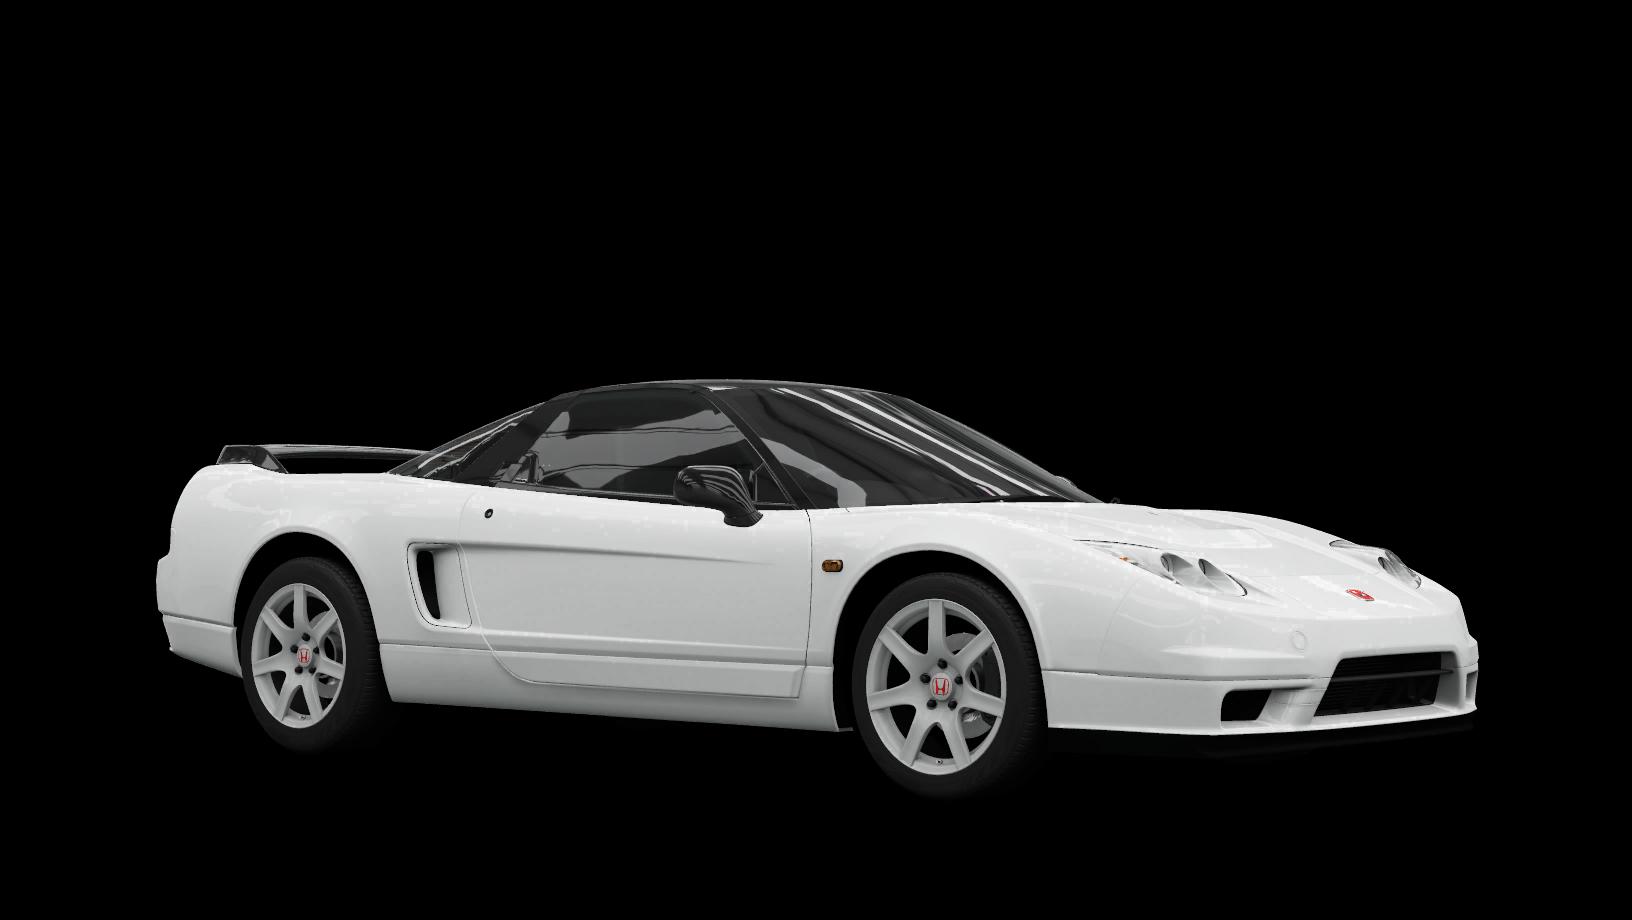 Honda NSX-R (2005) | Forza Motorsport Wiki | Fandom